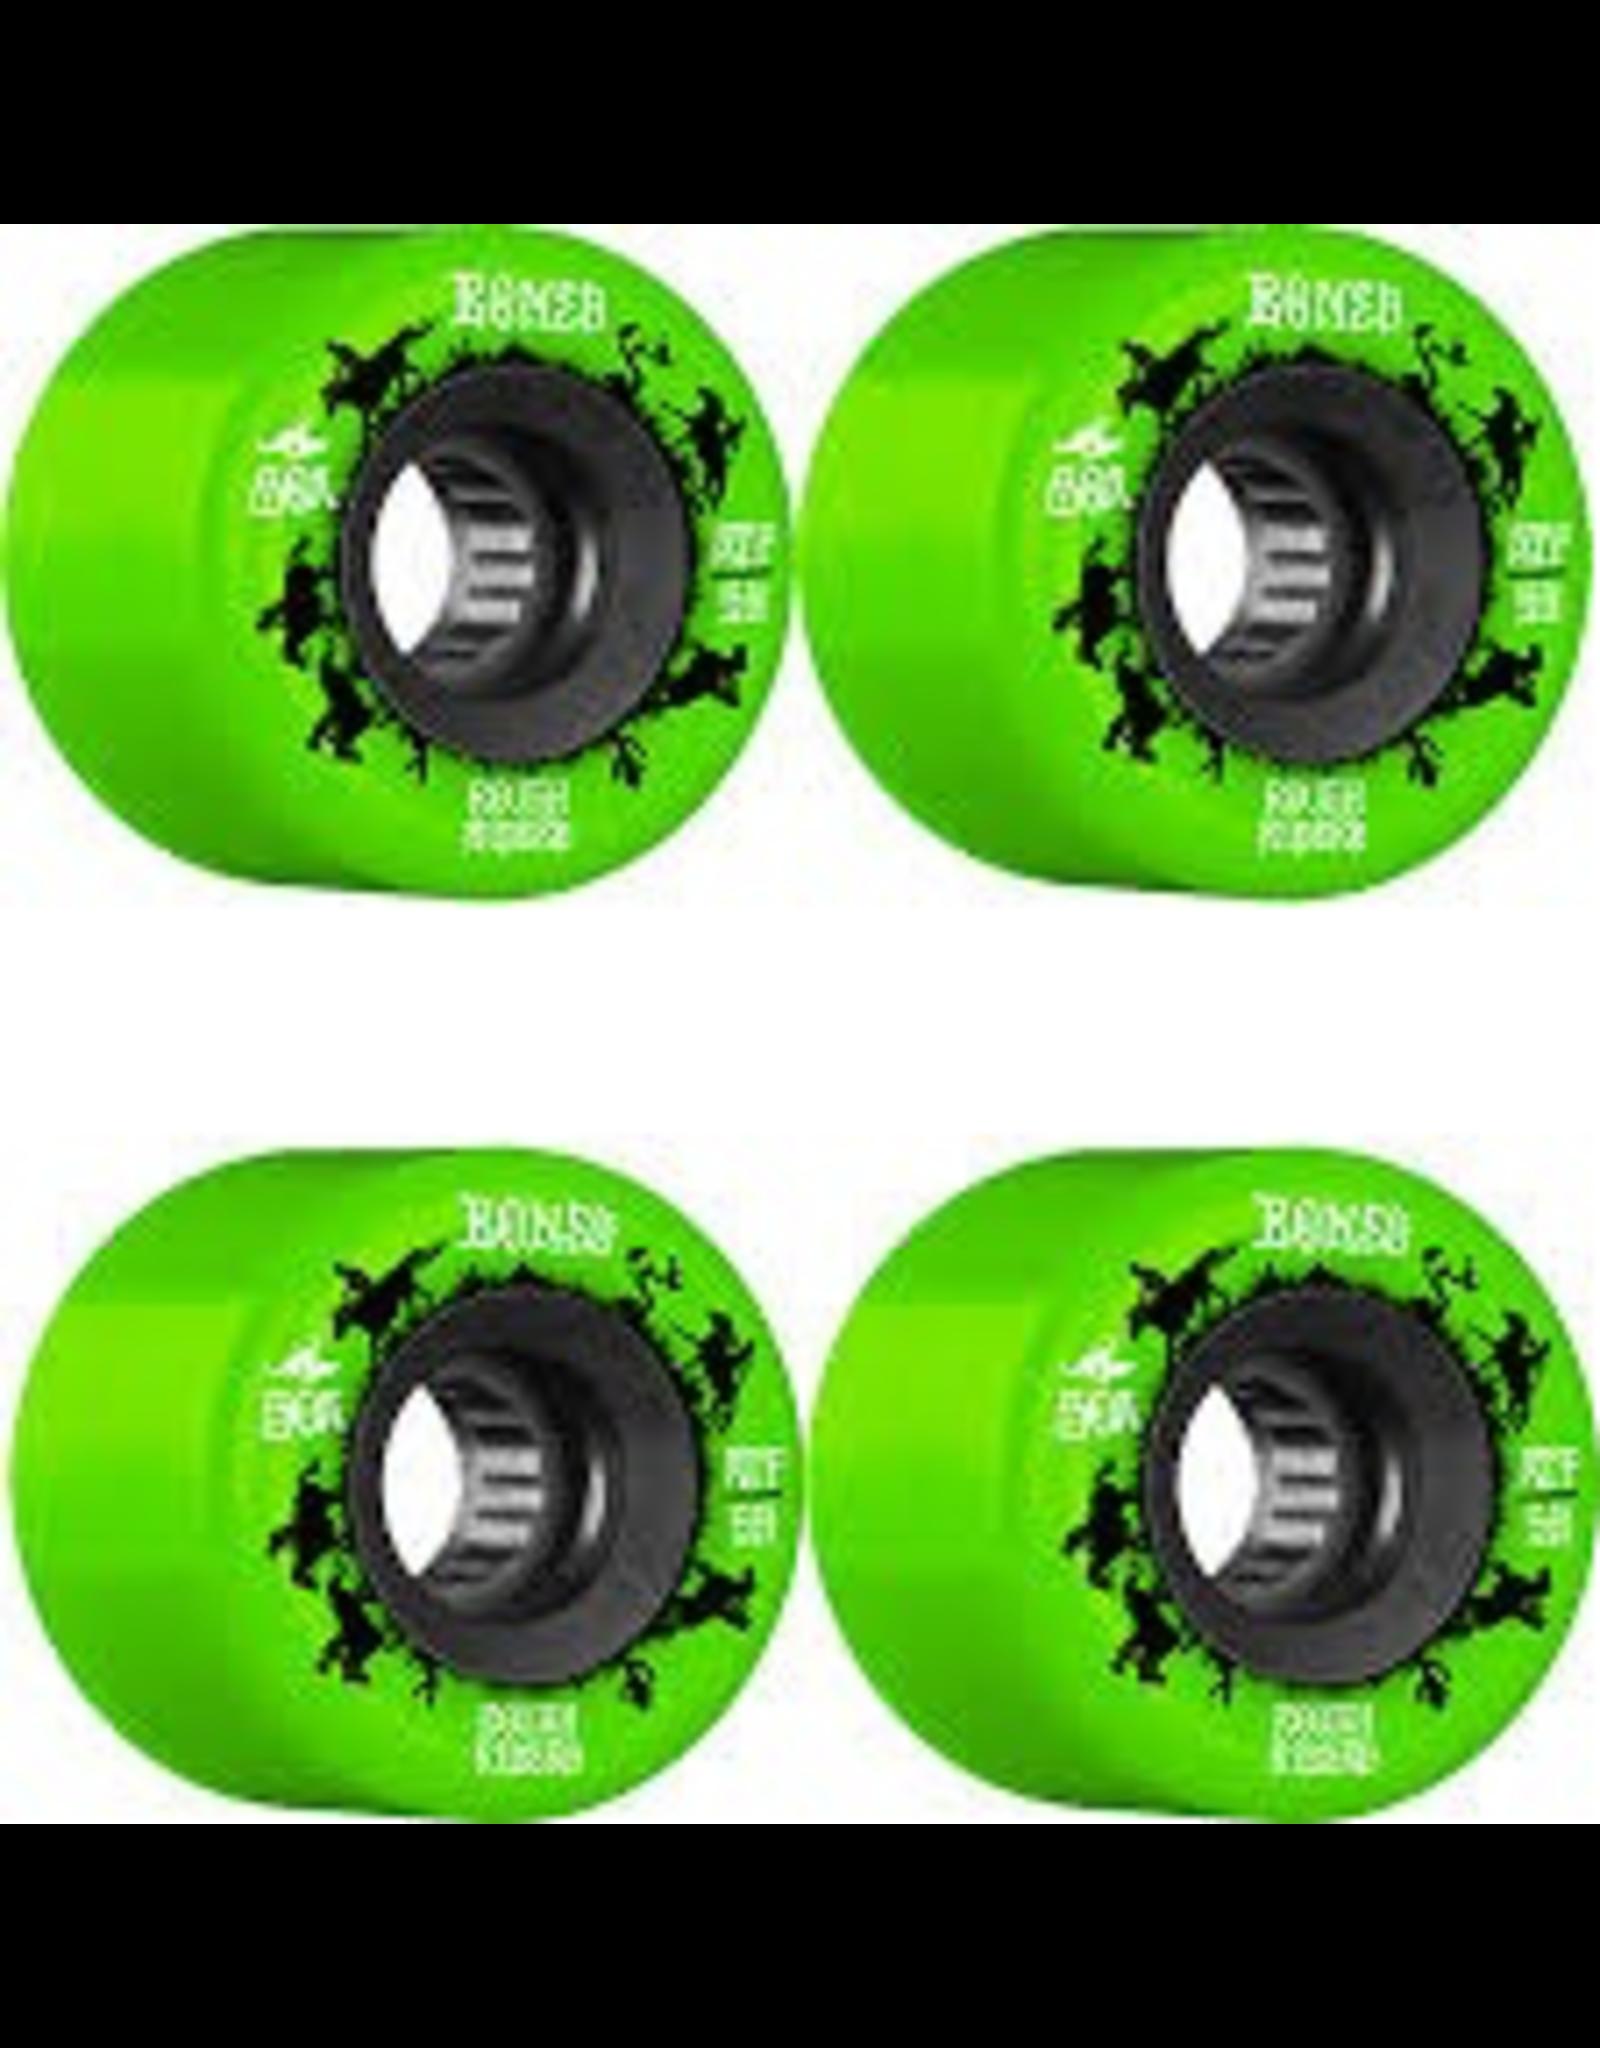 BONES BONES BONES WHEELS ROUGH RIDERS WRANGLERS WHEELS (GREEN) 59MM